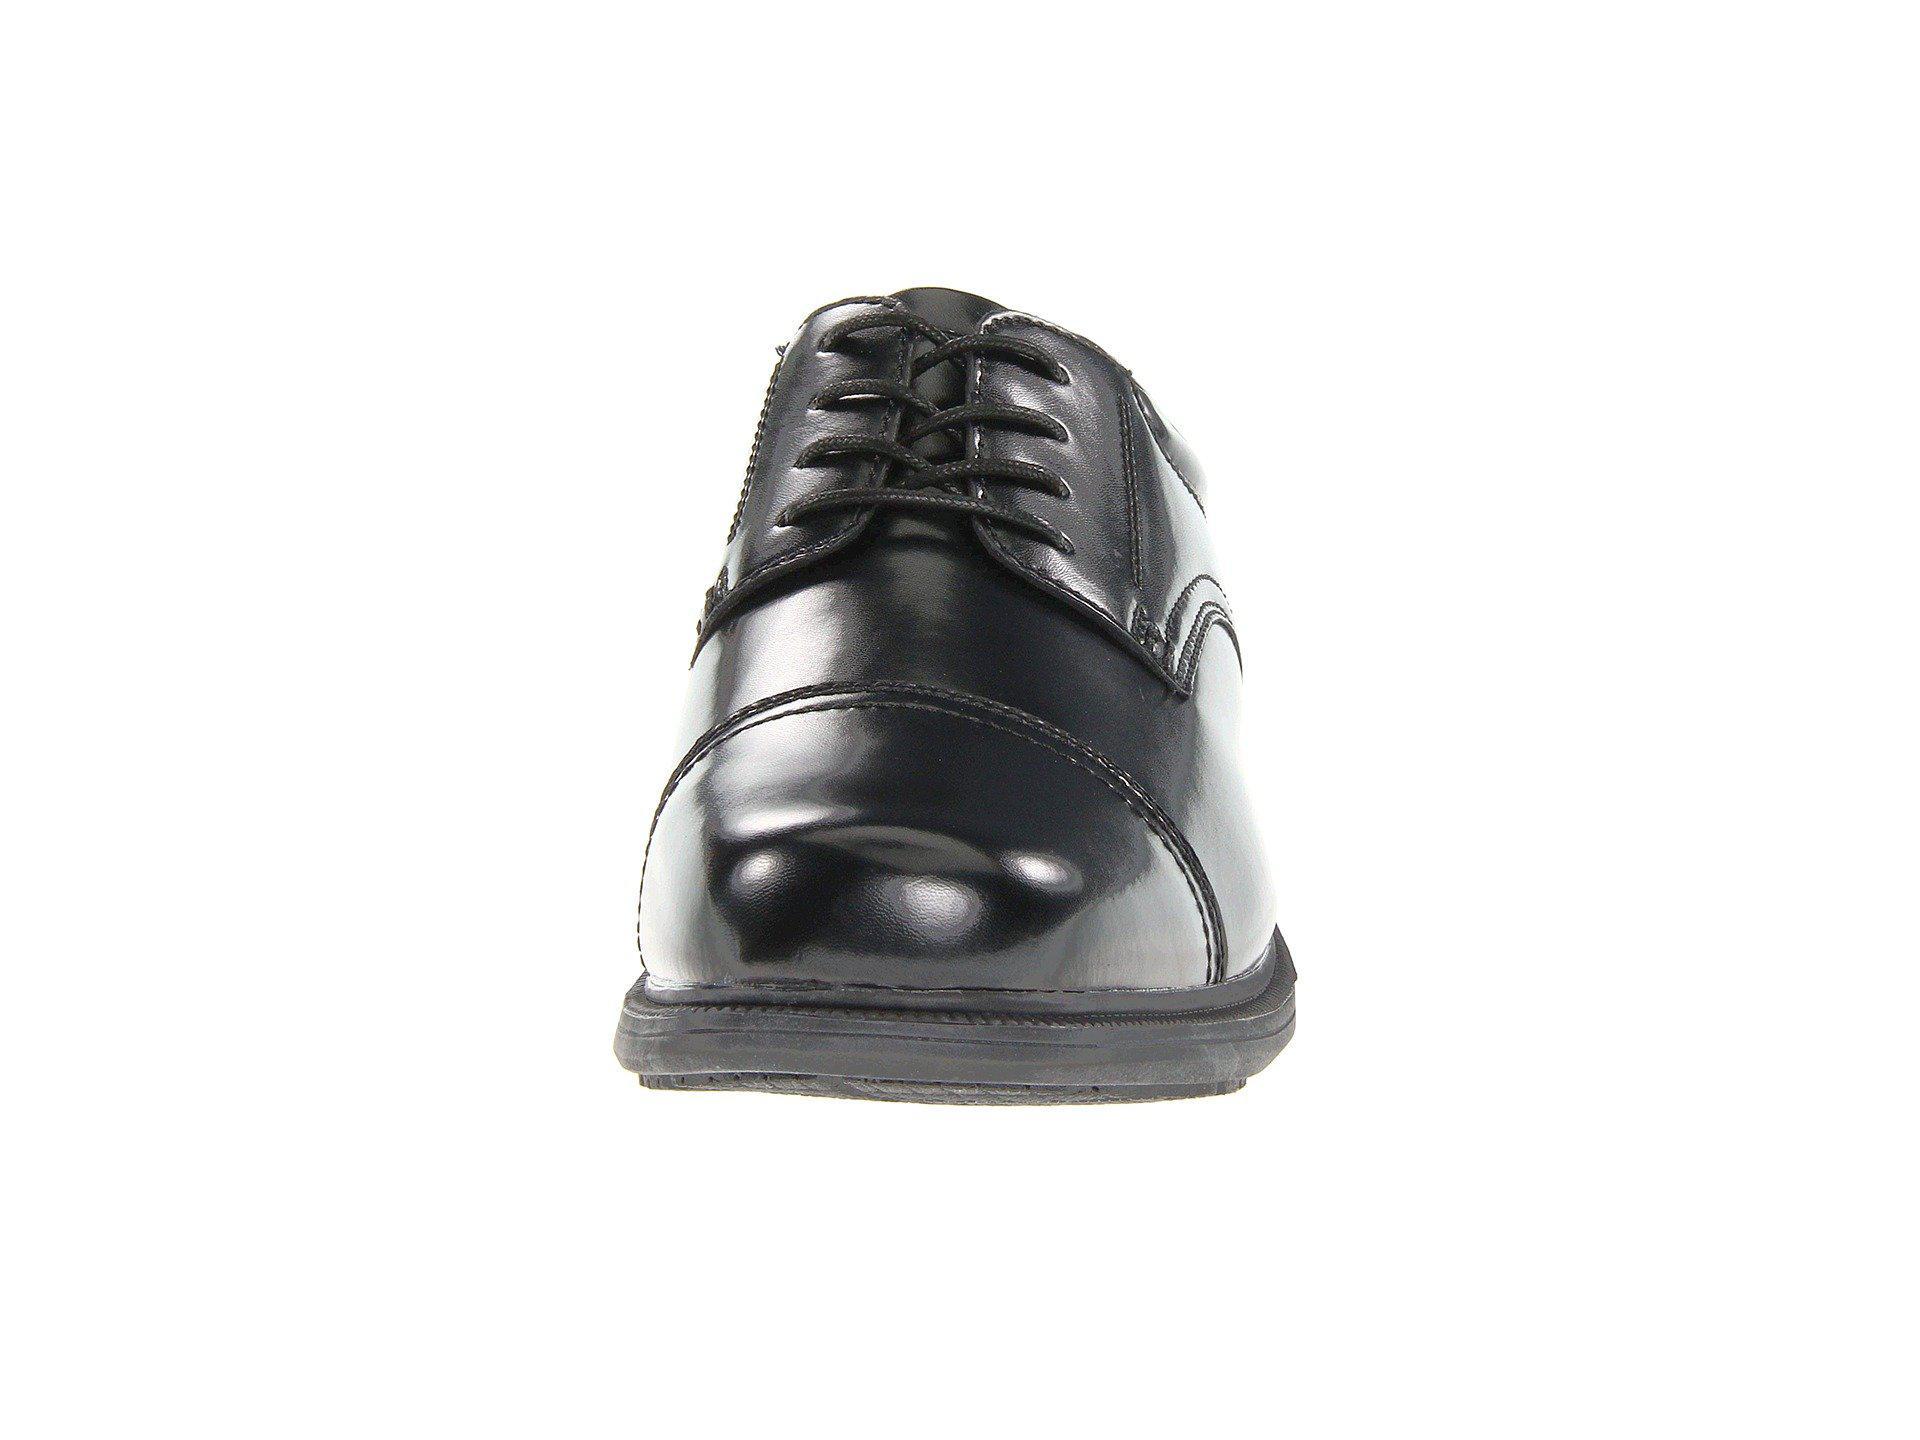 6c2c132bae Lyst - Nunn Bush Beale St. Cap Toe Oxford in Black for Men